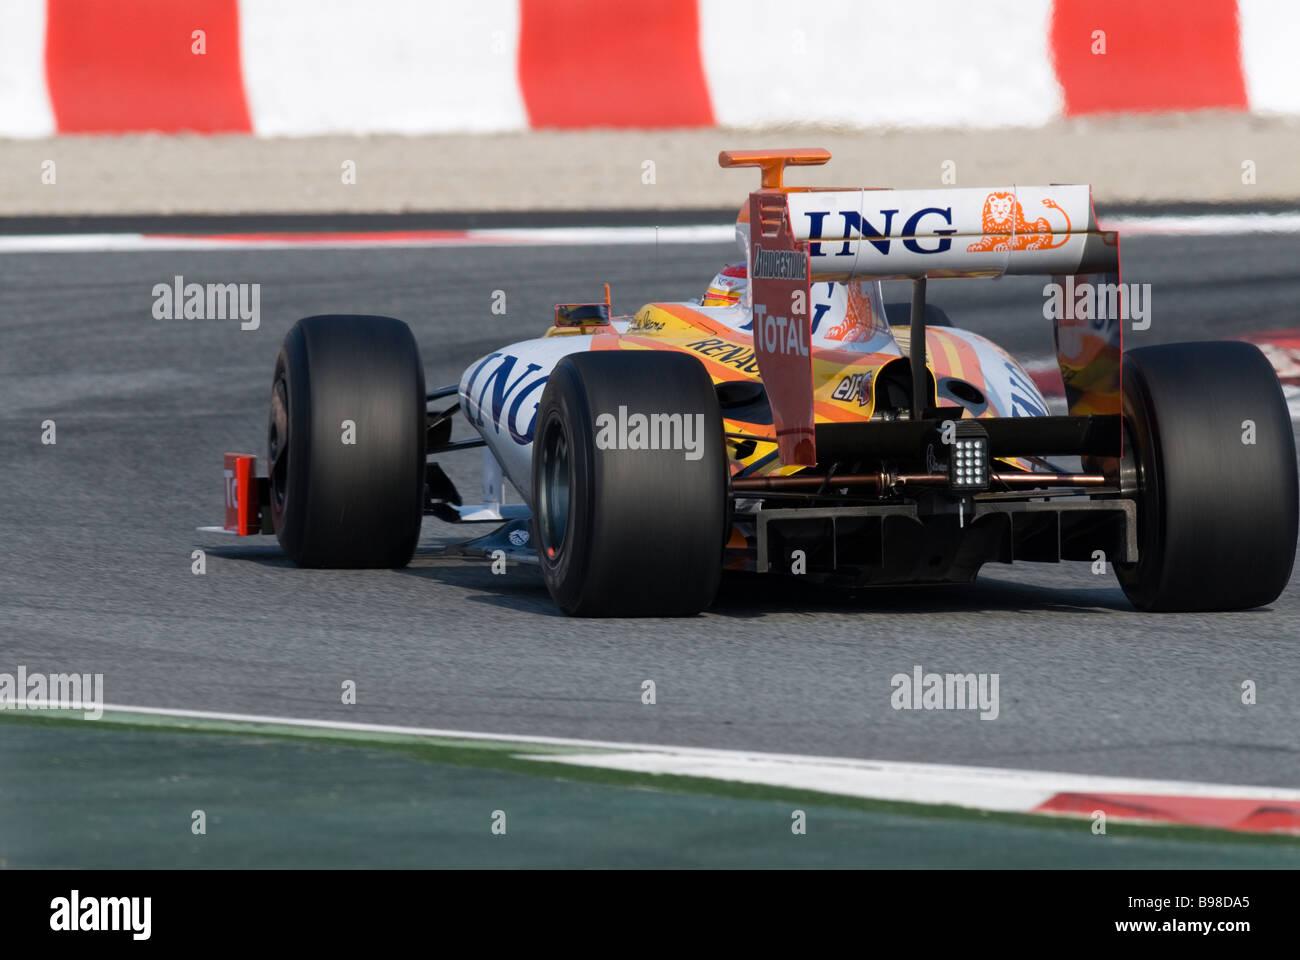 Motorsport; Rennen; Racing; Auto; Carrace; Rennwagen Stockbild